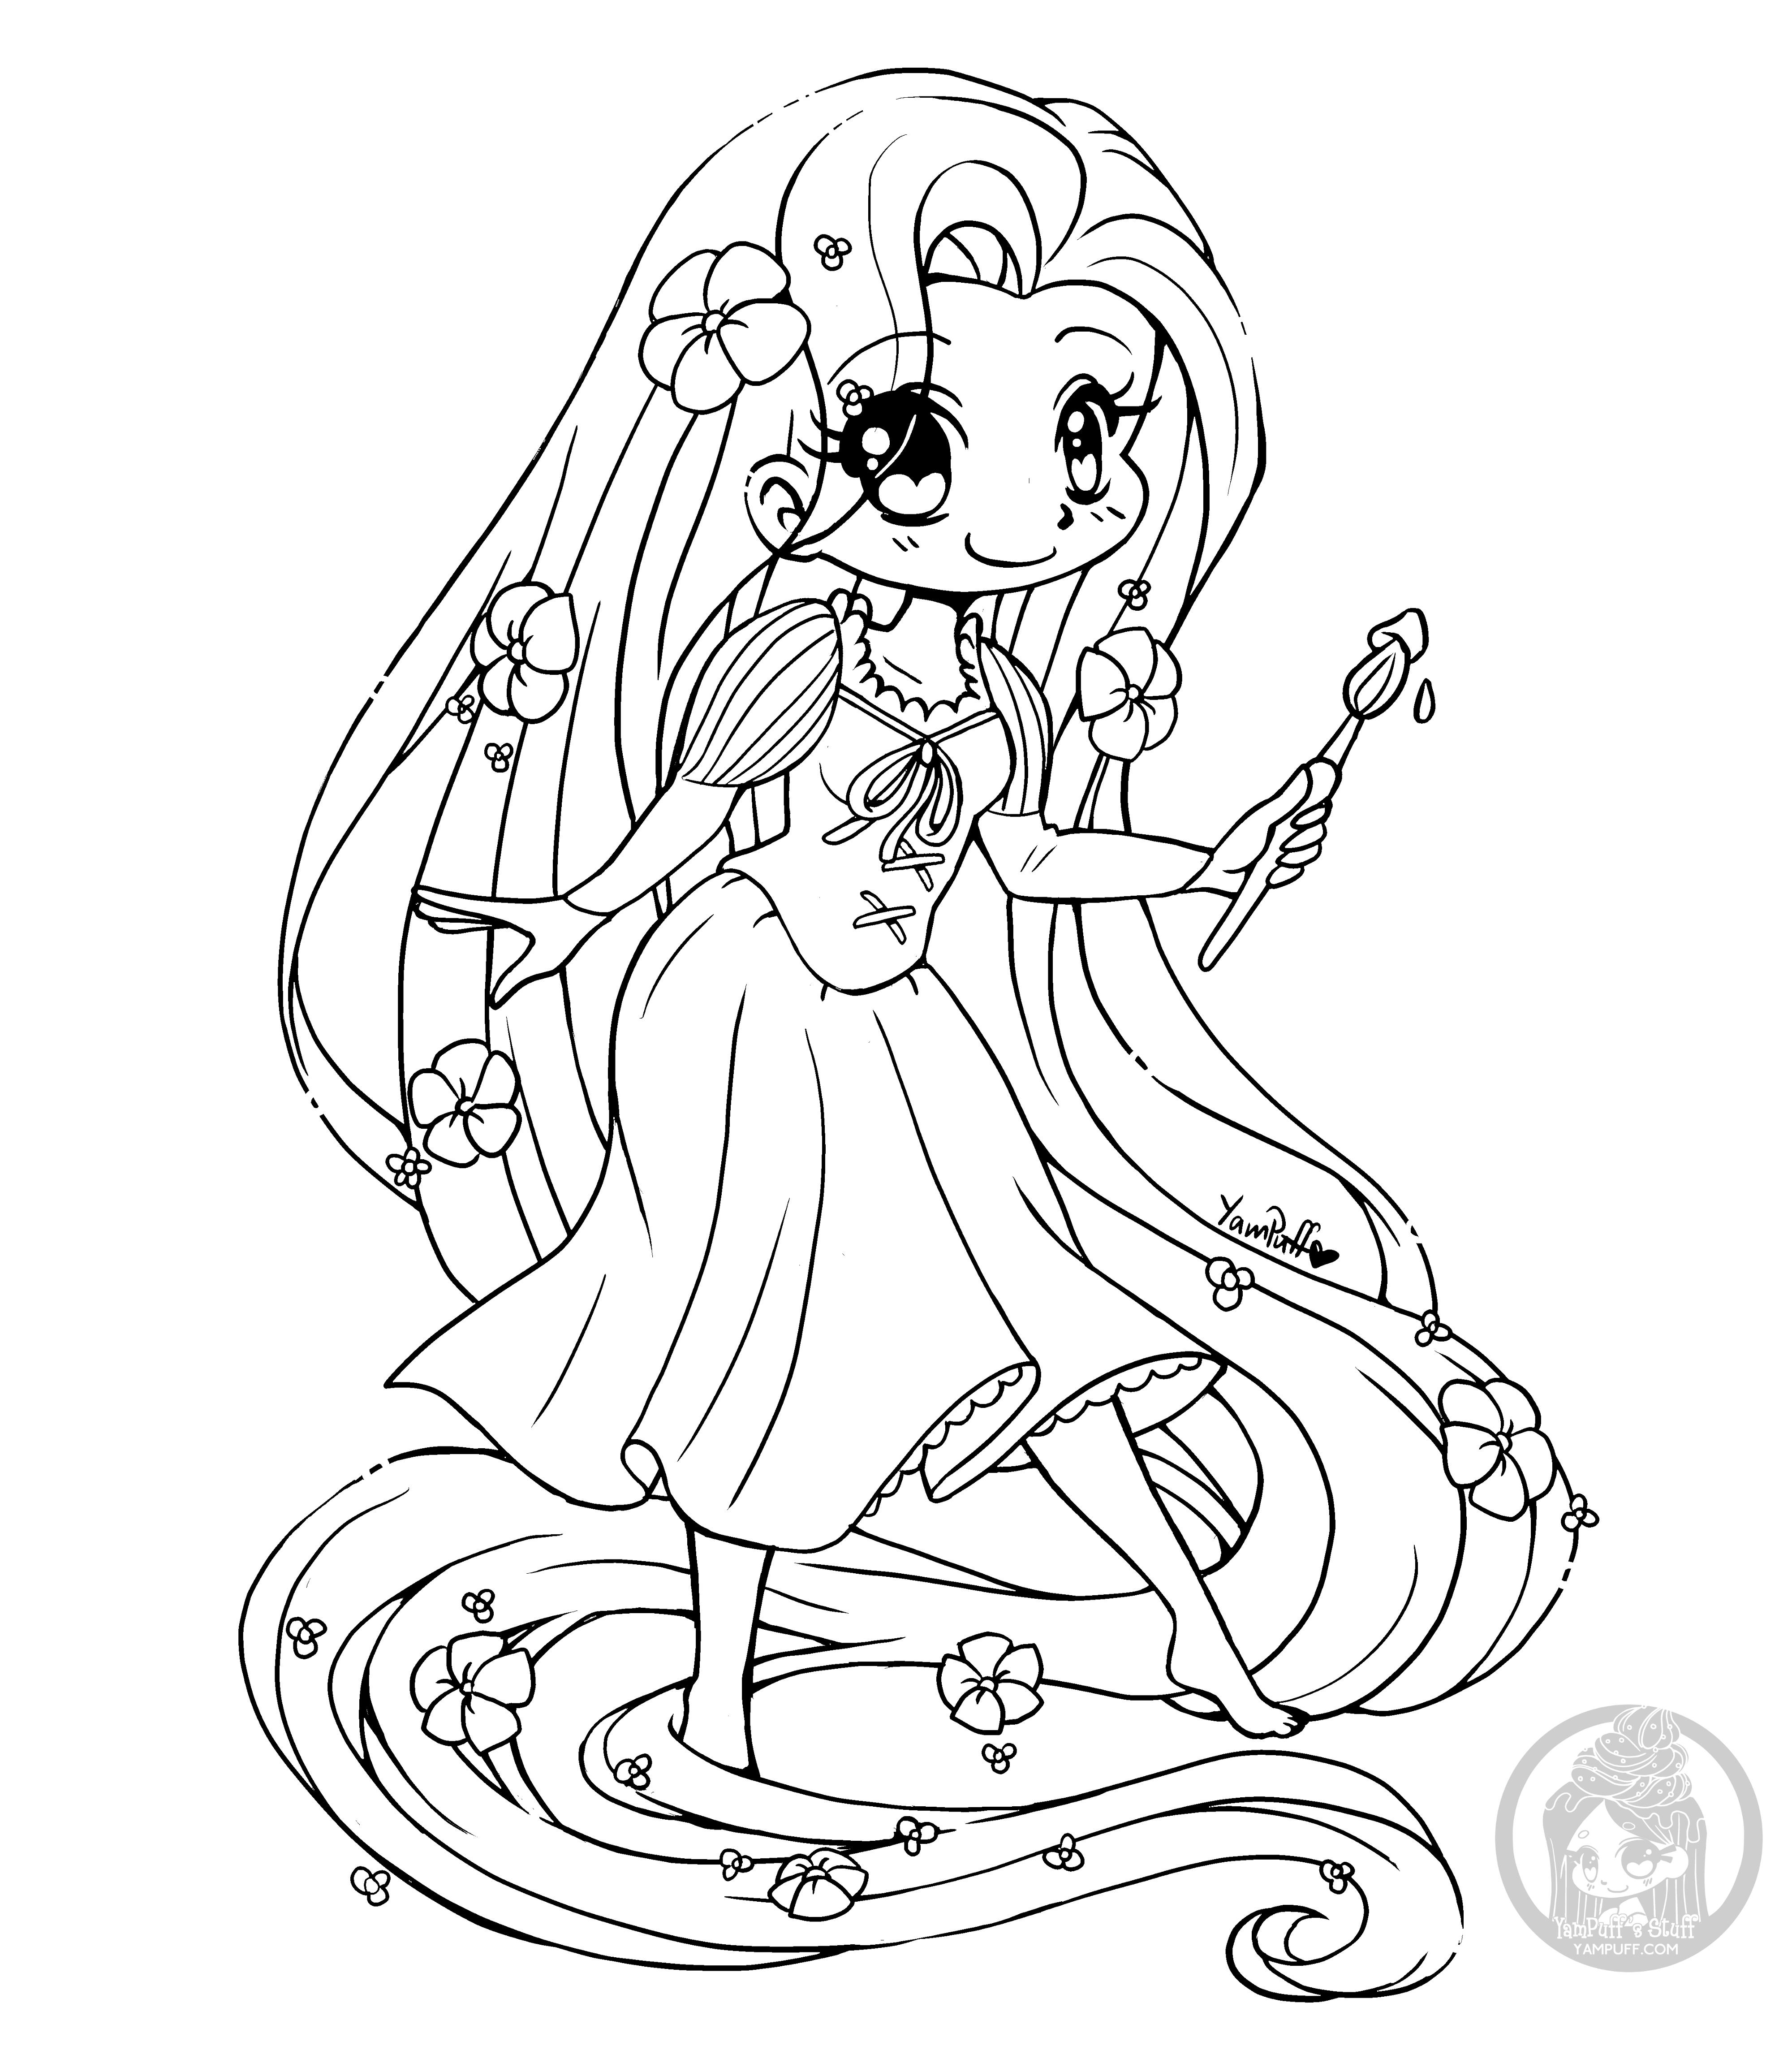 Rapunzel Lineart Update! • YamPuff's Stuff